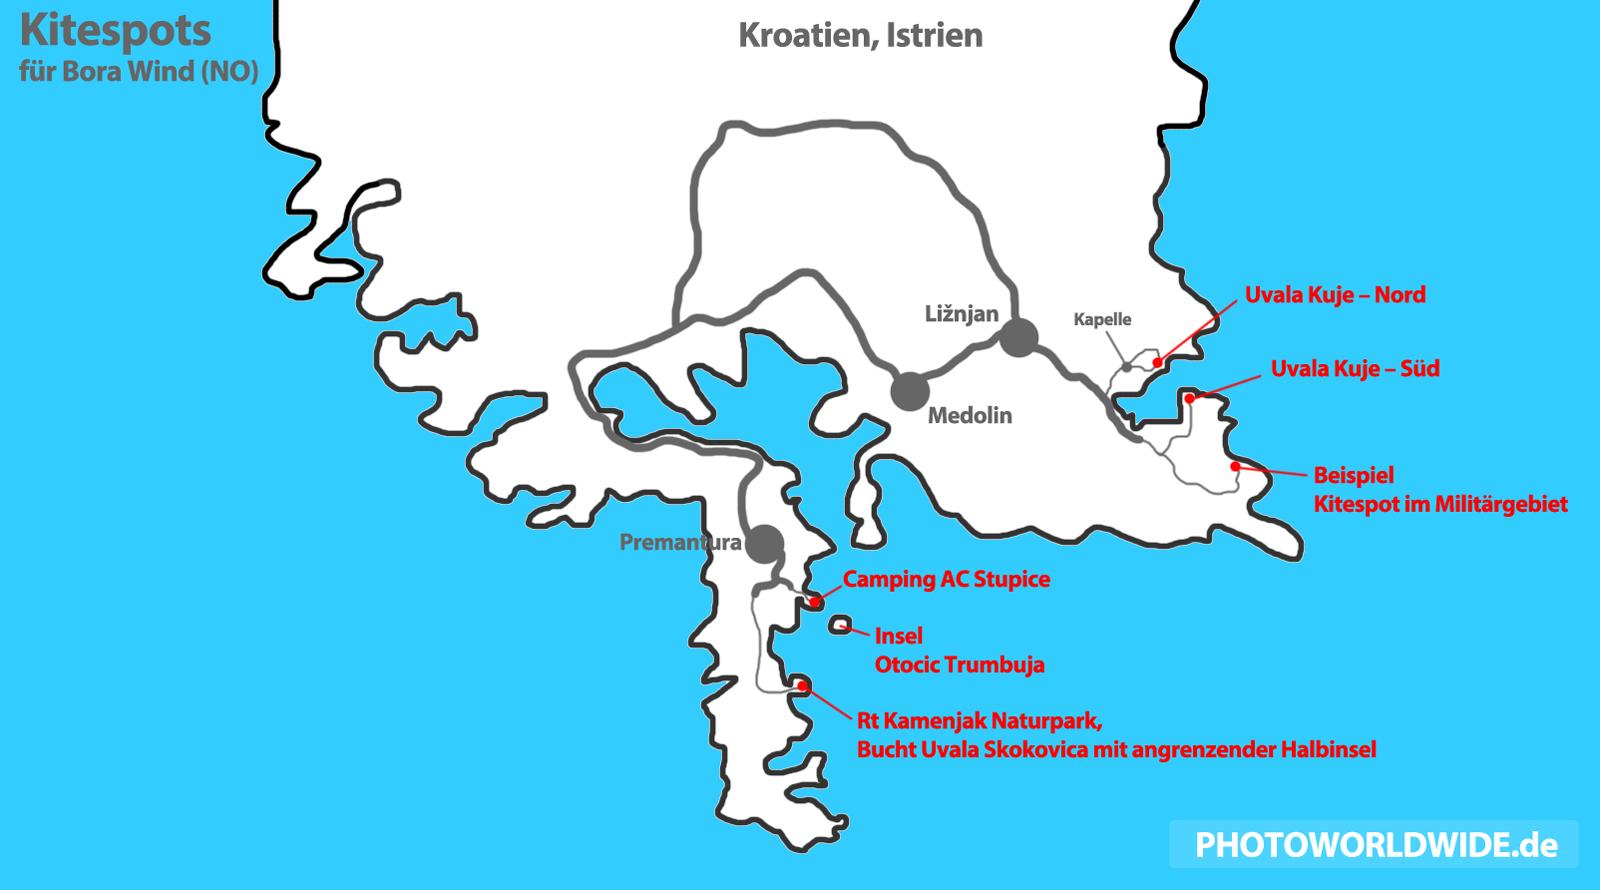 Karte Istrien Kroatien.Kitespotbeschreibung Premantura Liznjan In Istrien Womo